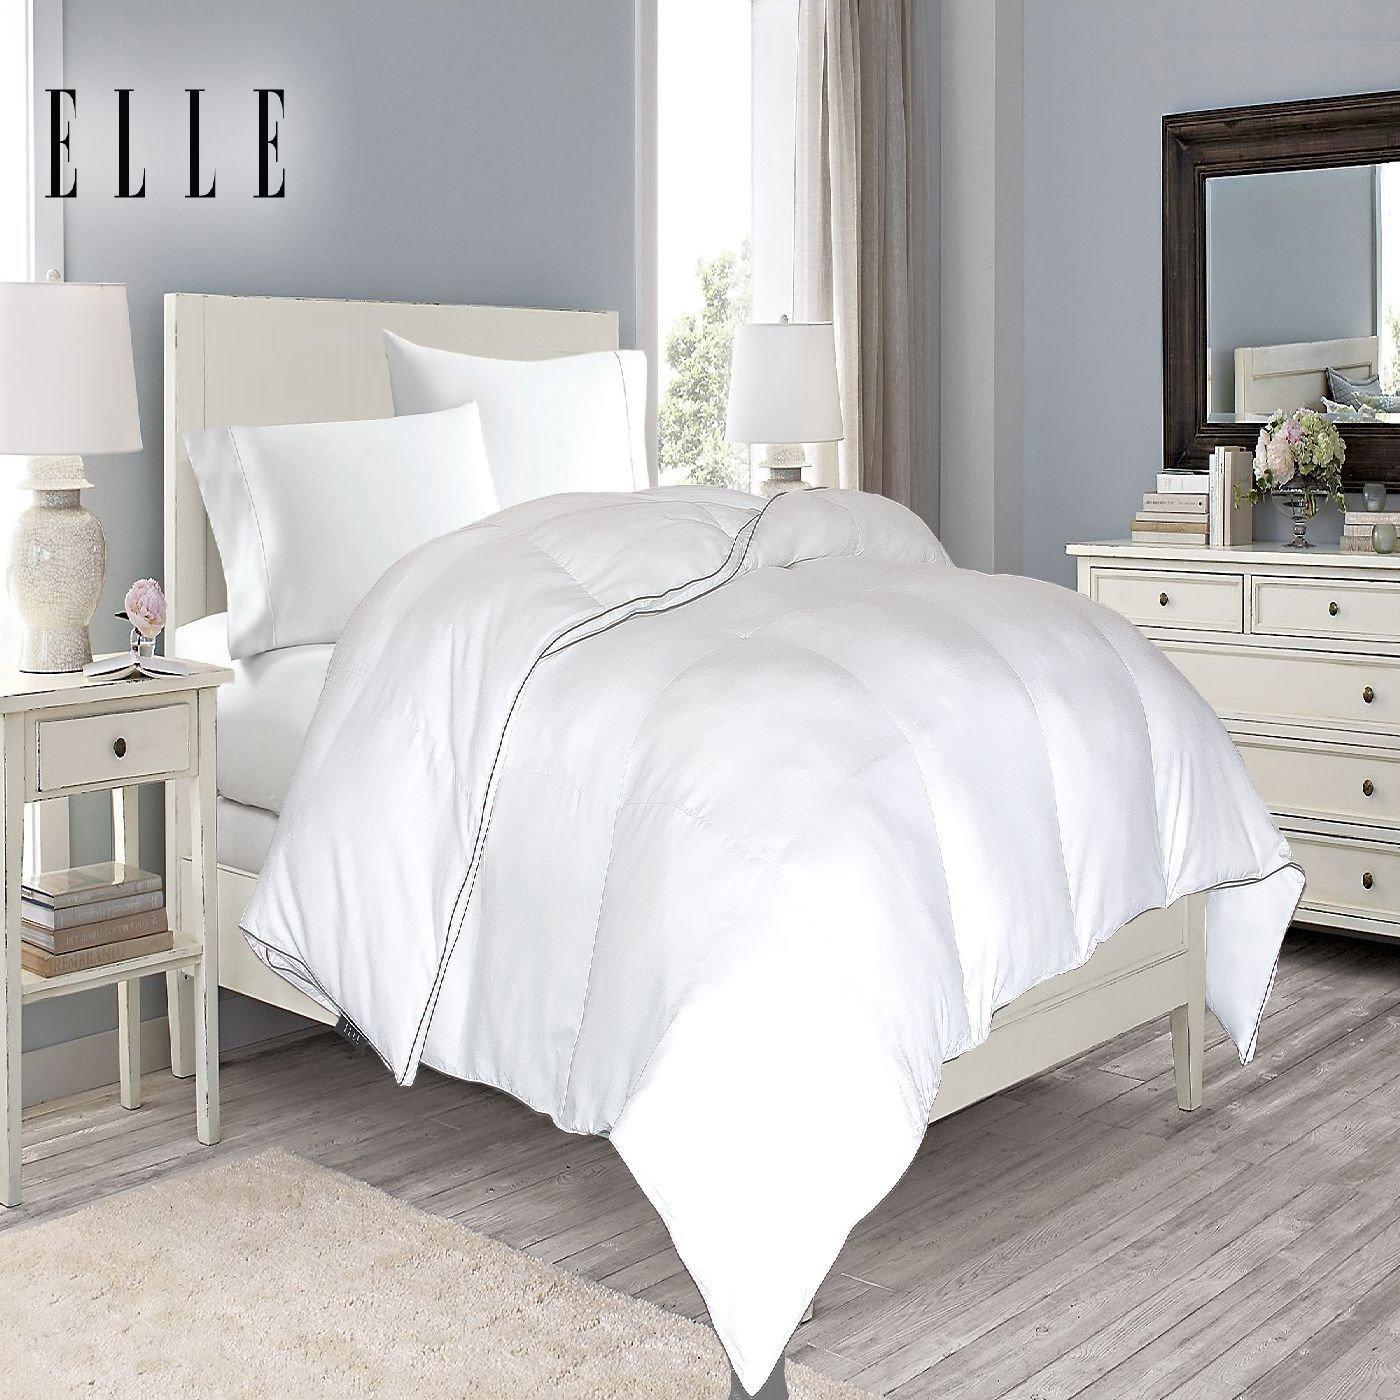 Amazon.com: Elle 1200 Thread Count Cotton Rich Solid Down ...